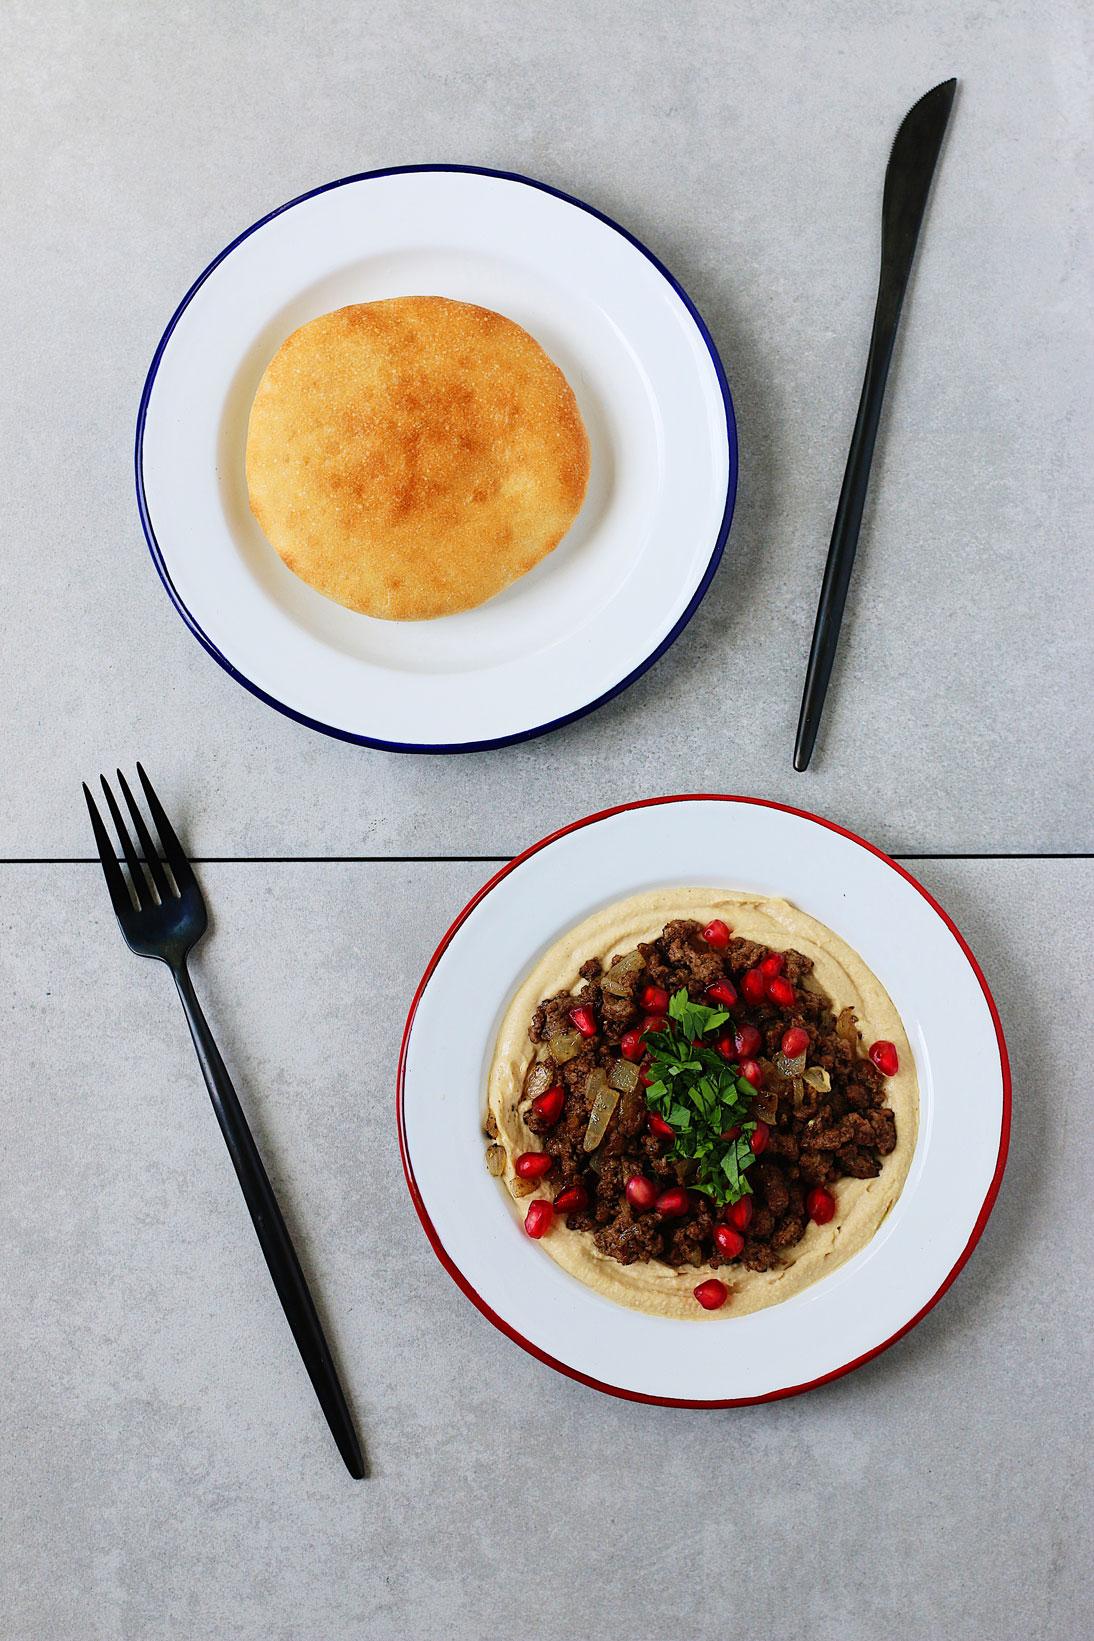 Her-Cookbook-Club-Molly-On-the-Range-meet-on-hummus